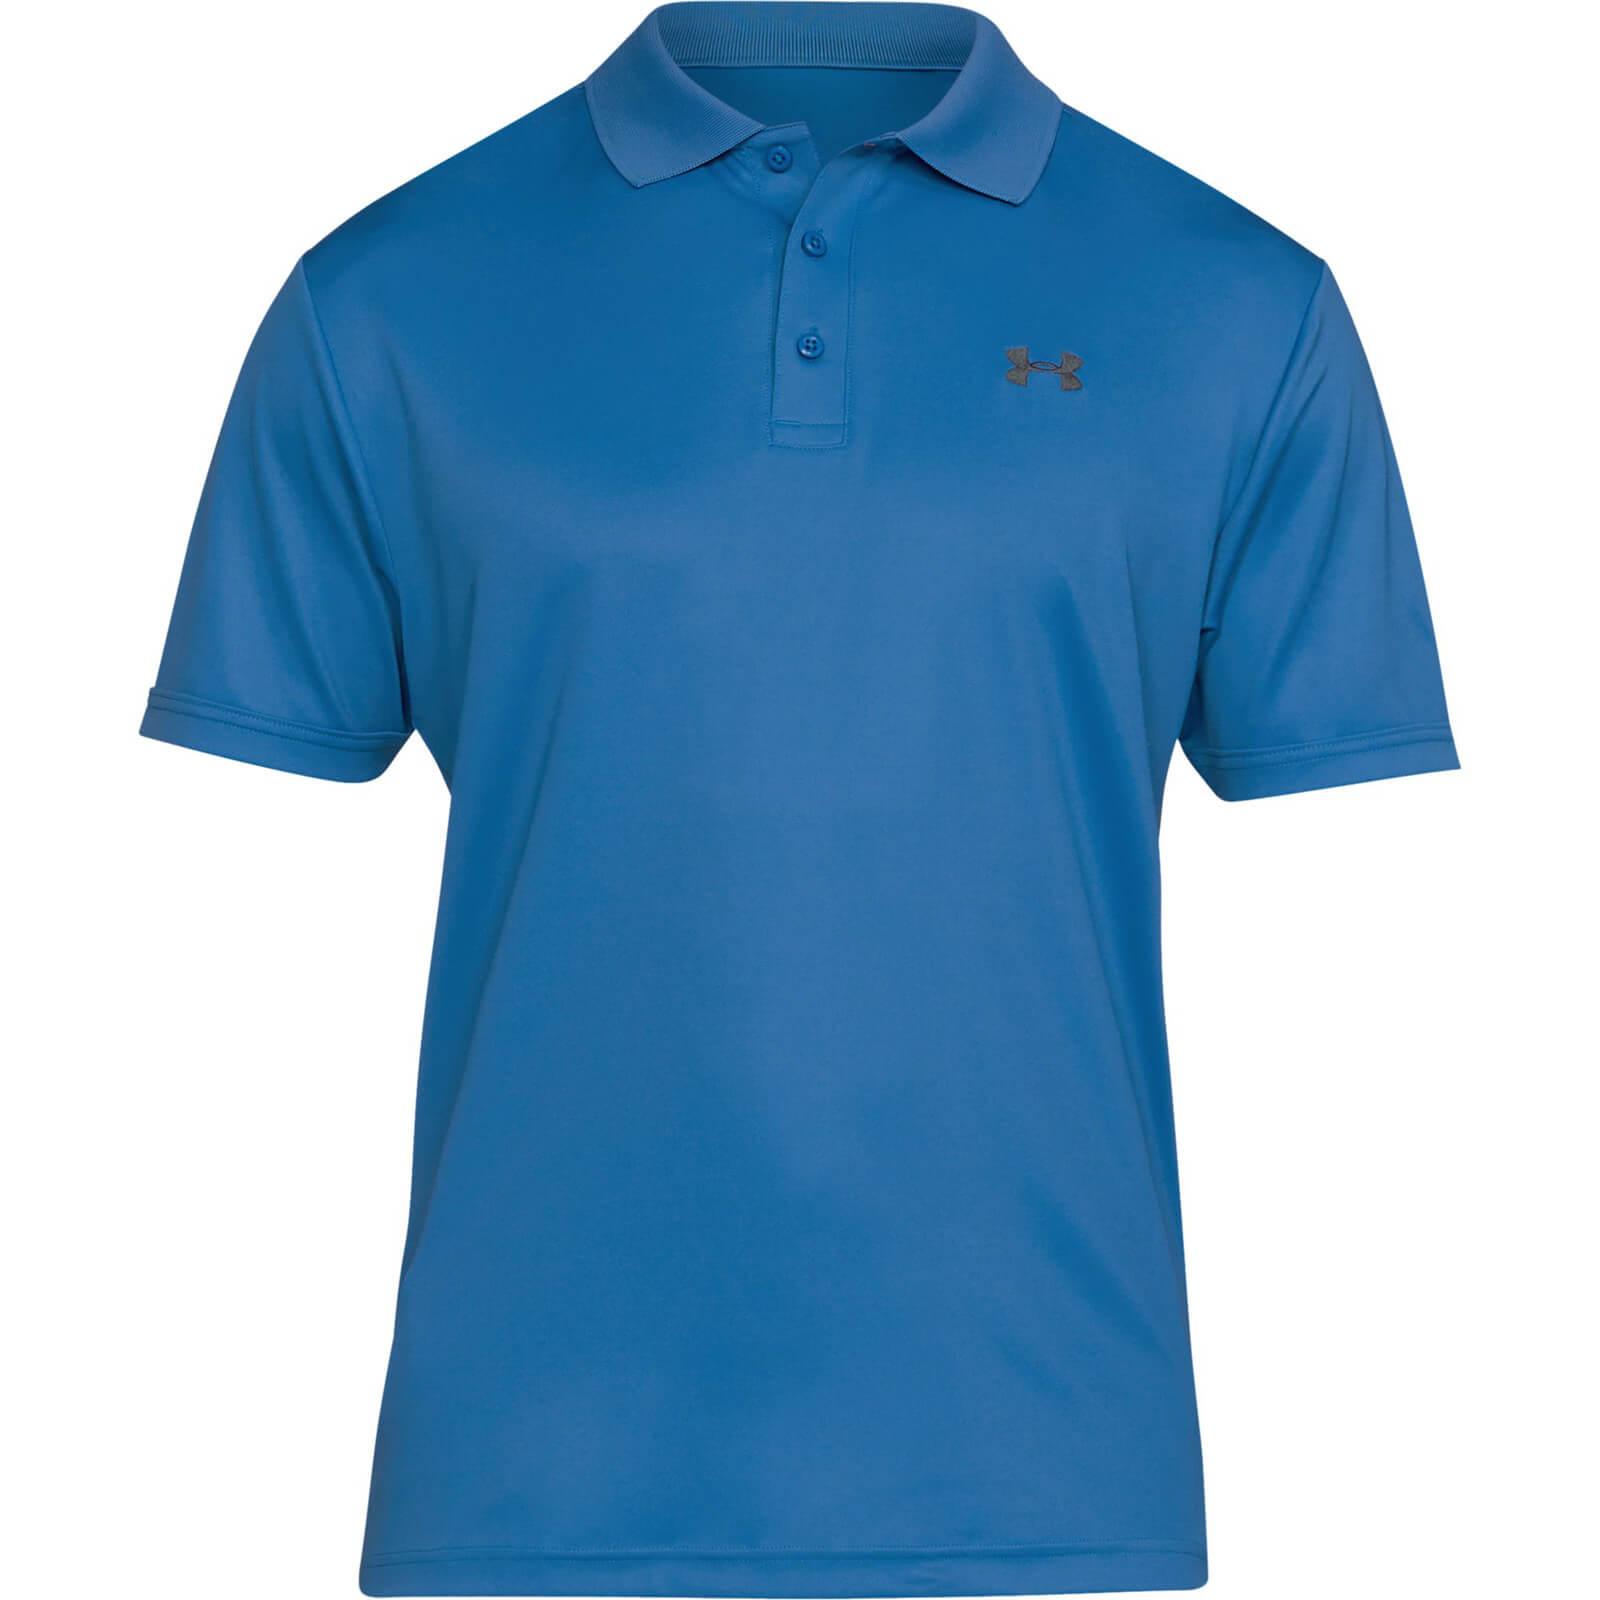 Under armour men 39 s performance polo shirt blue for Under armour men s shirts clearance